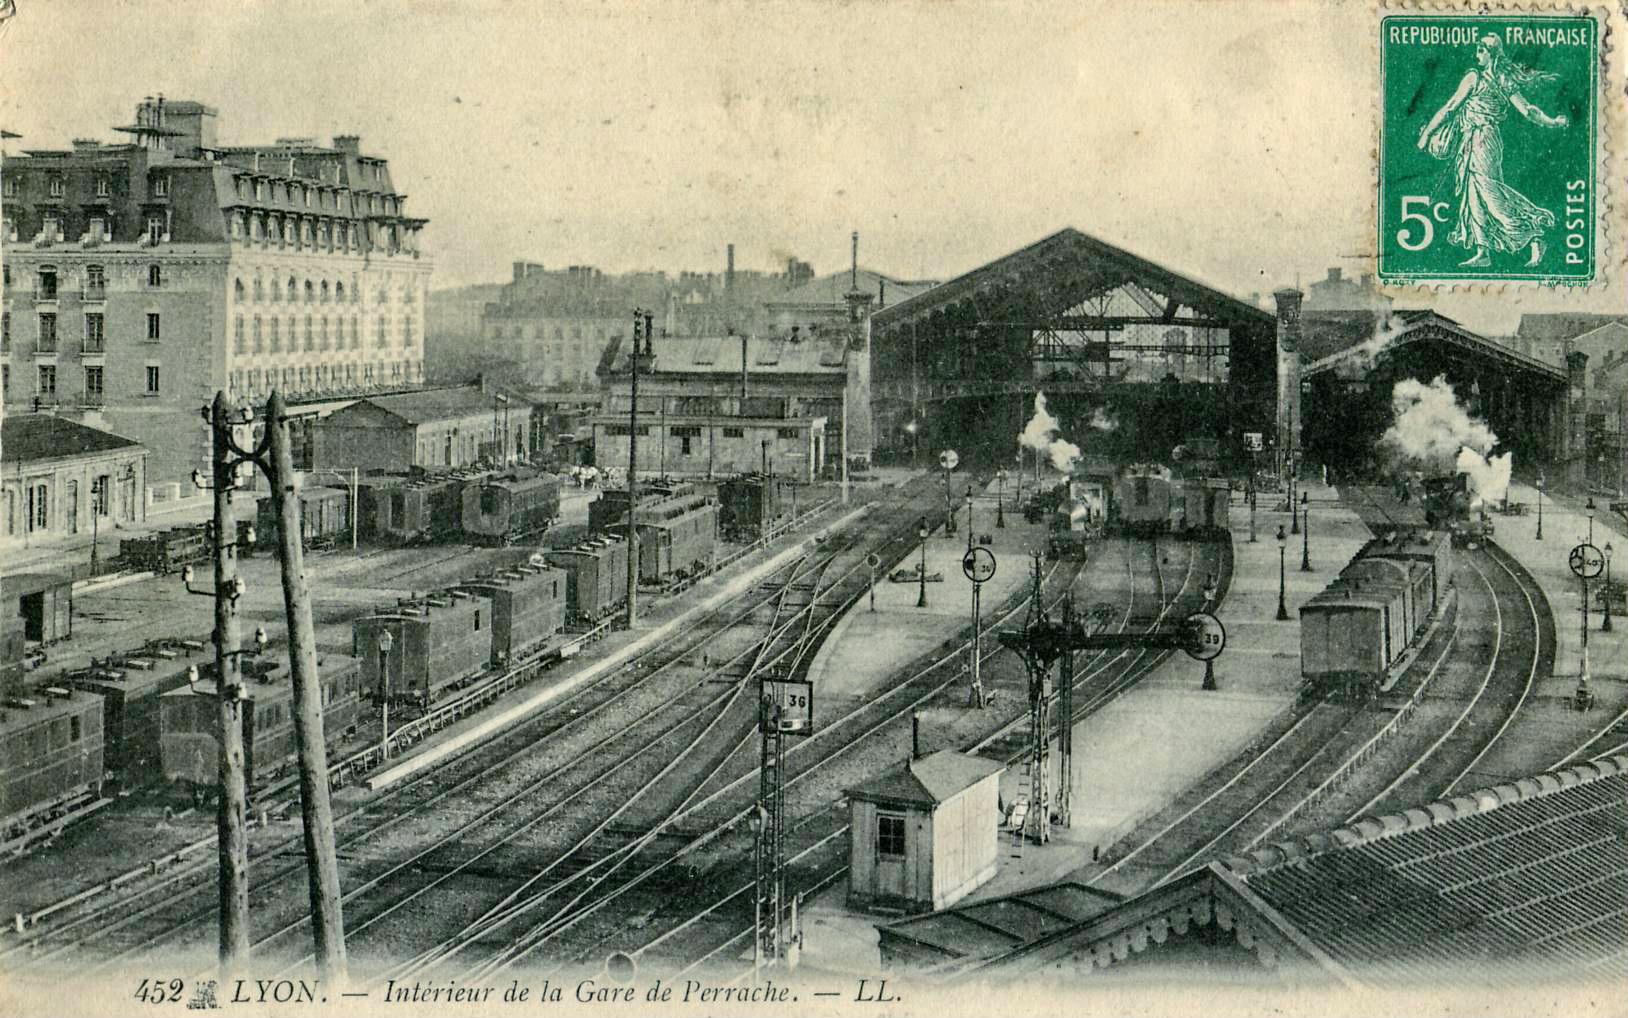 Станция Аррас, Франция